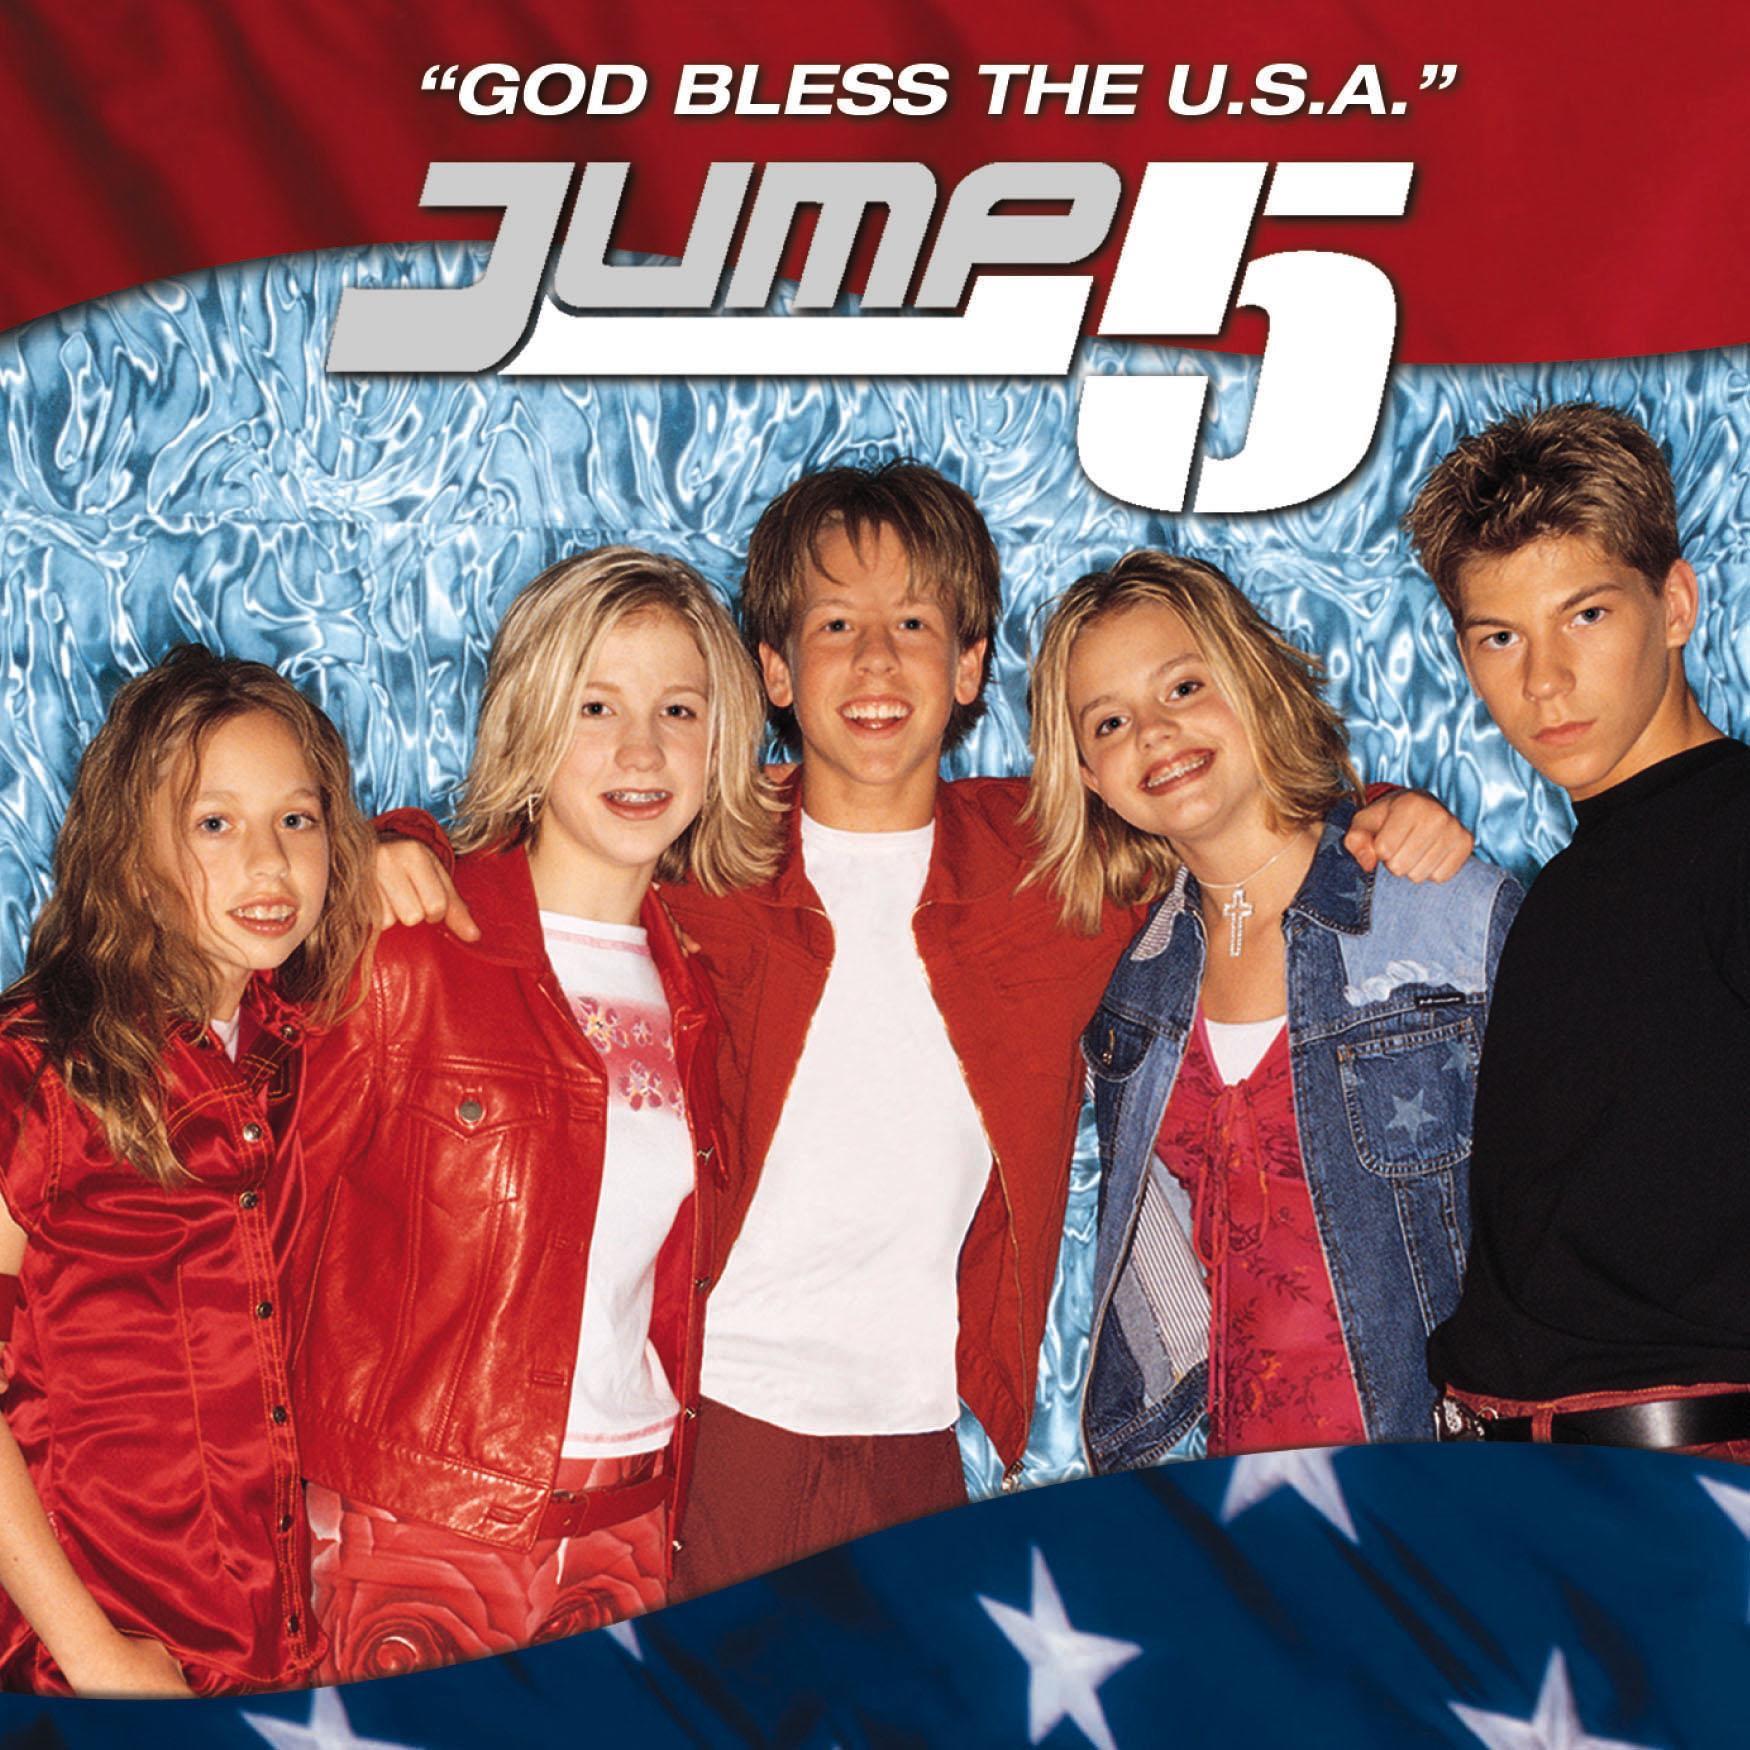 God Bless the U.S.A. - Single